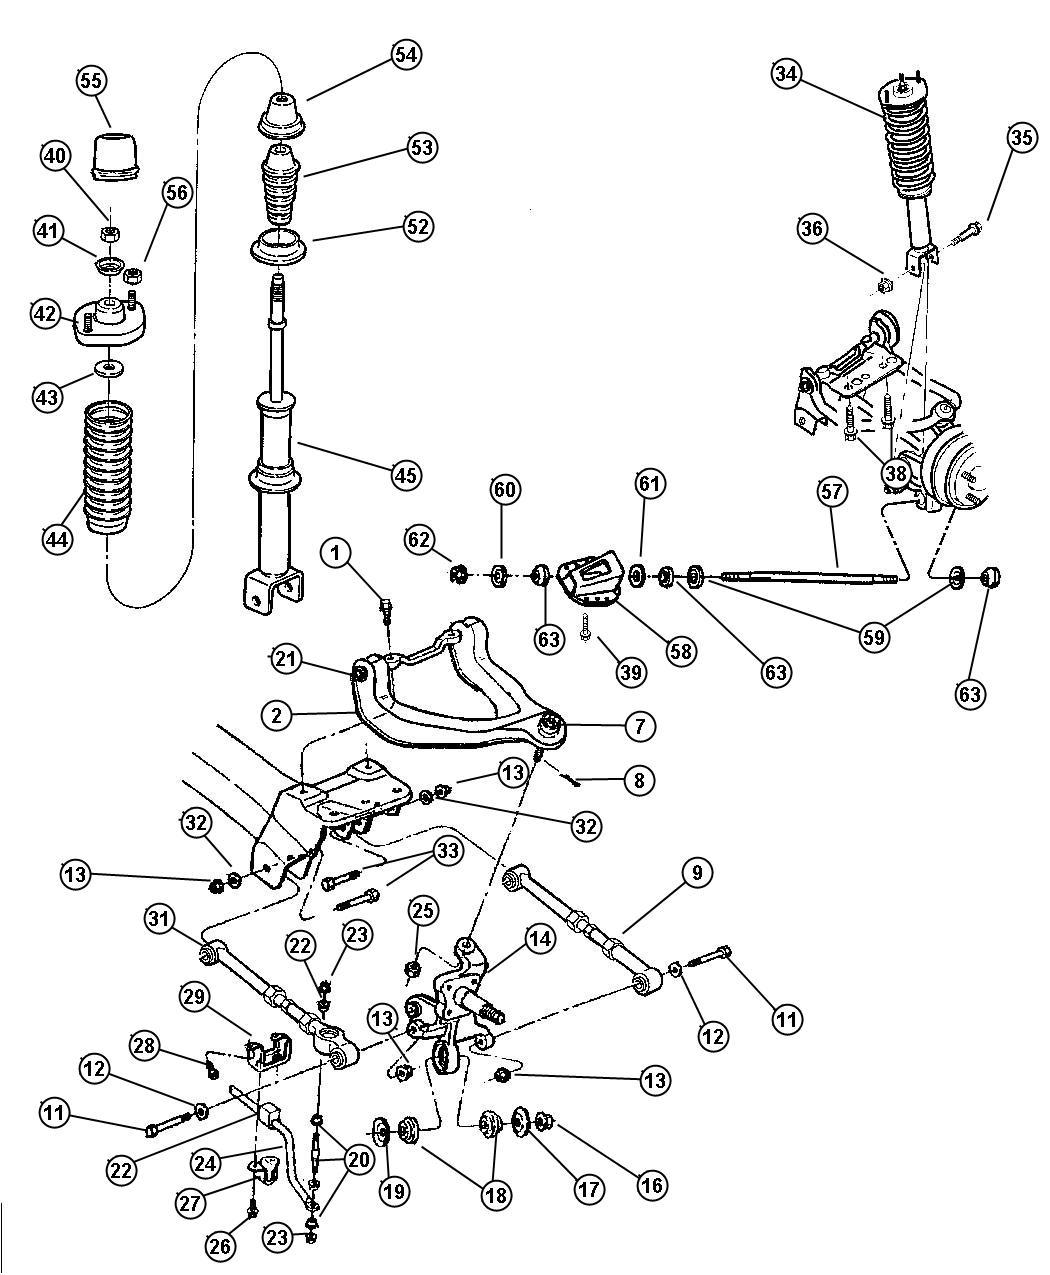 1998 Chrysler Sebring Suspension, Rear.